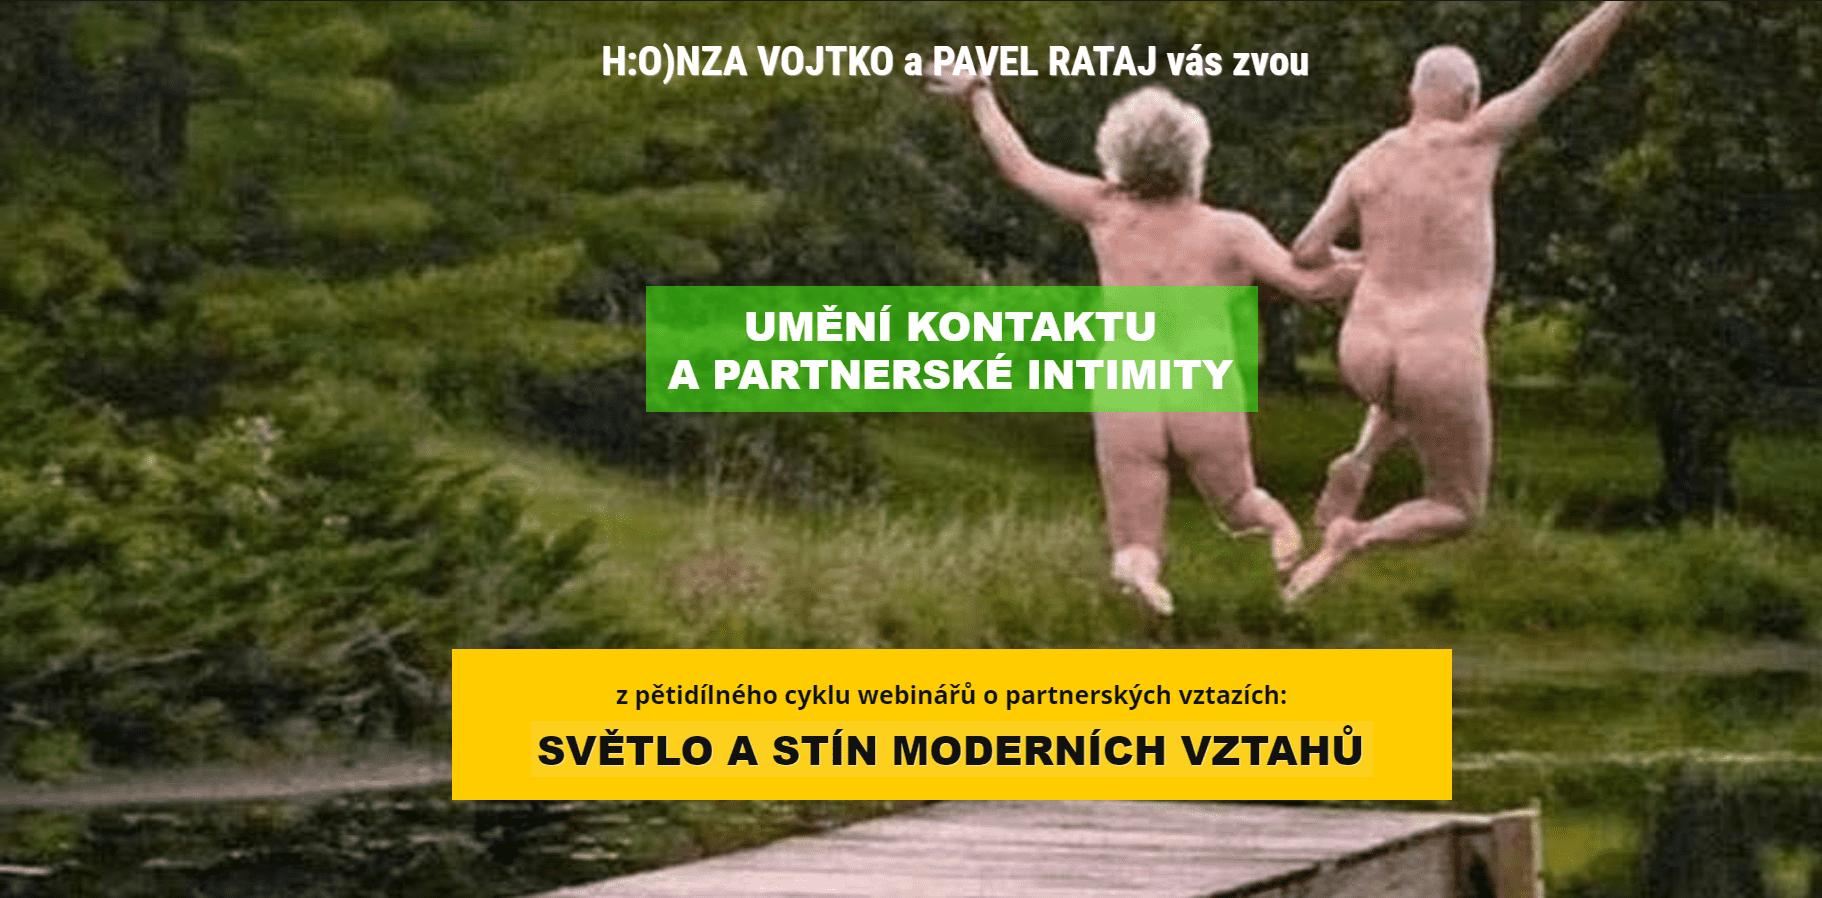 Partnerská intimita - Pavel Rataj aHonza Vojtko